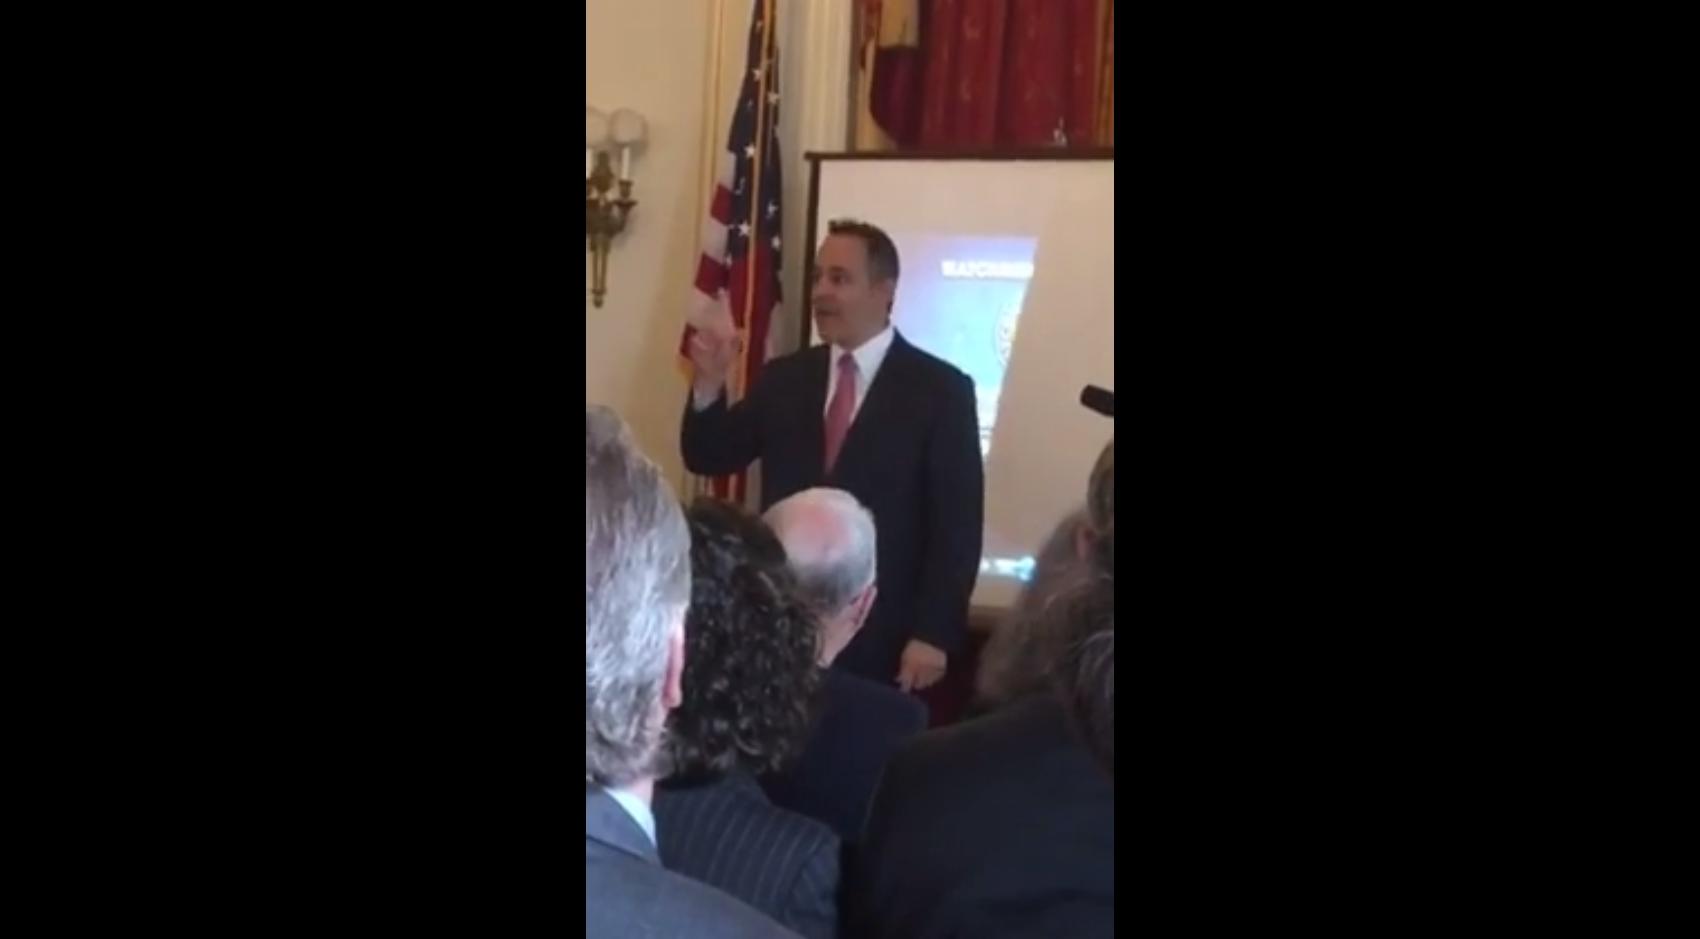 Does Kentucky Governor Matt Bevin Have Any Idea What the Johnson Amendment Prohibits?